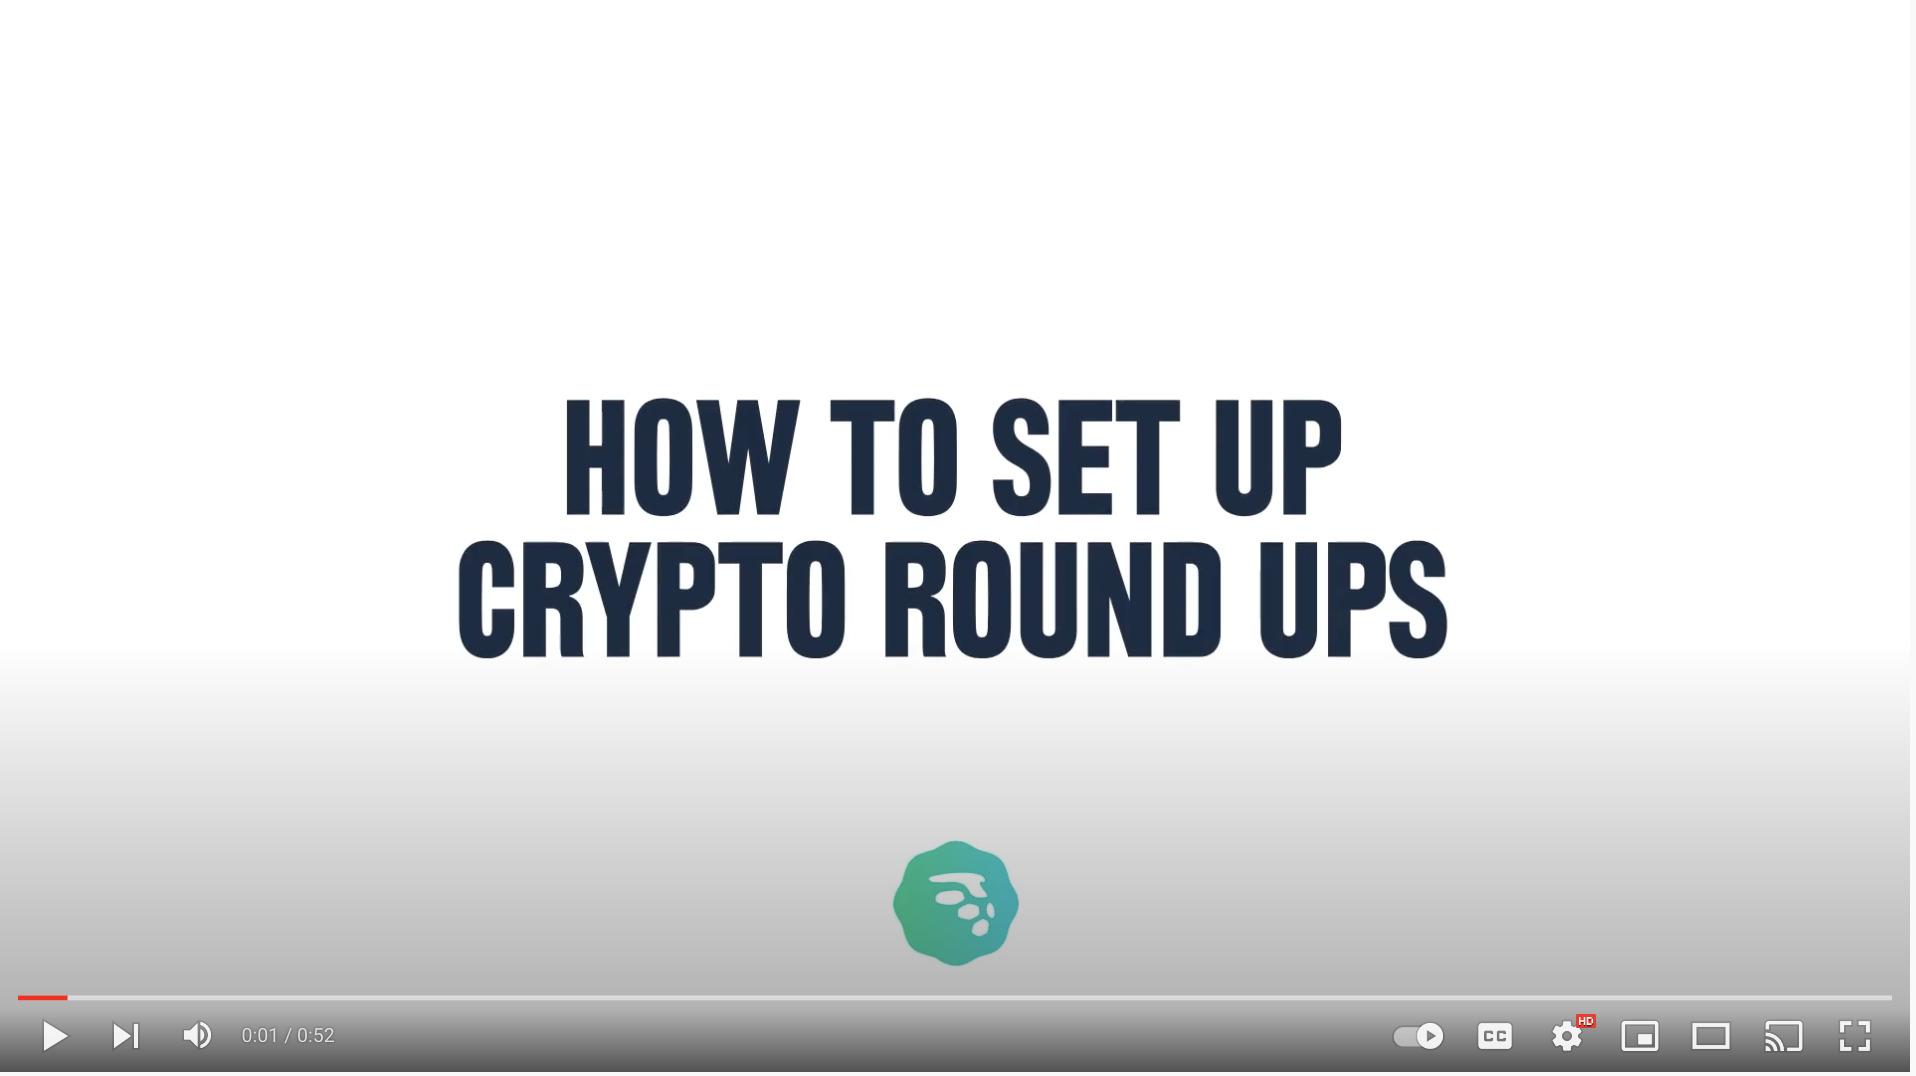 how to set up crypto round ups